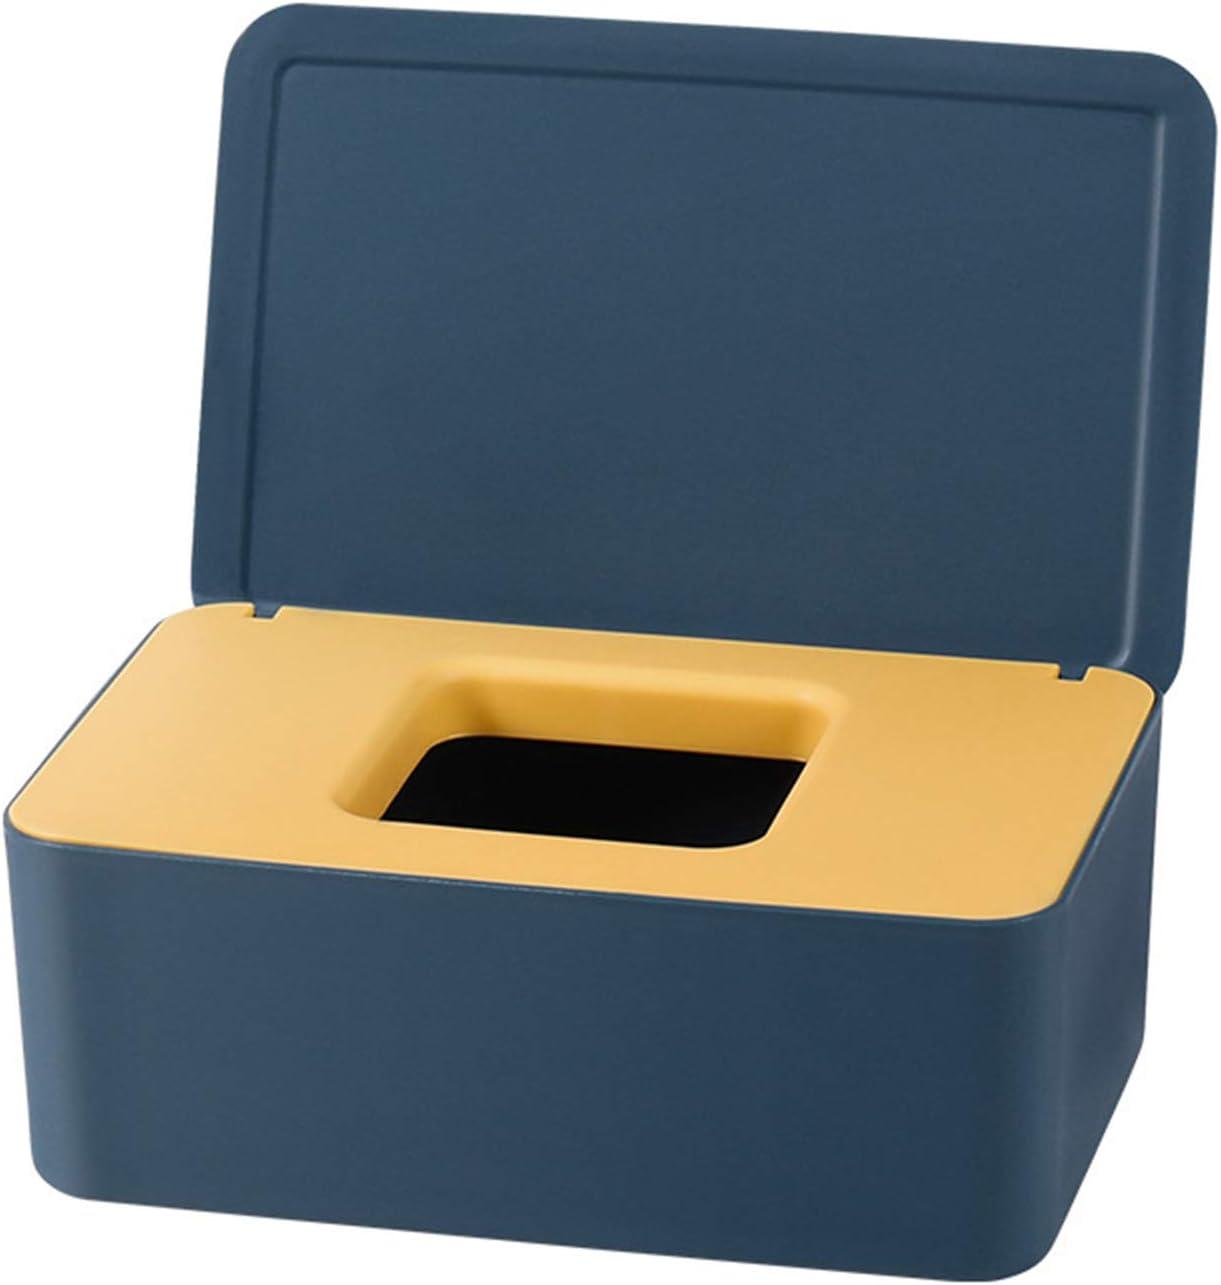 QKFON Caja de almacenamiento para toallitas húmedas, toallitas húmedas, para papel de seda seco y húmedo, soporte para servilletas, toallitas húmedas, soporte dispensador con tapa para el hogar